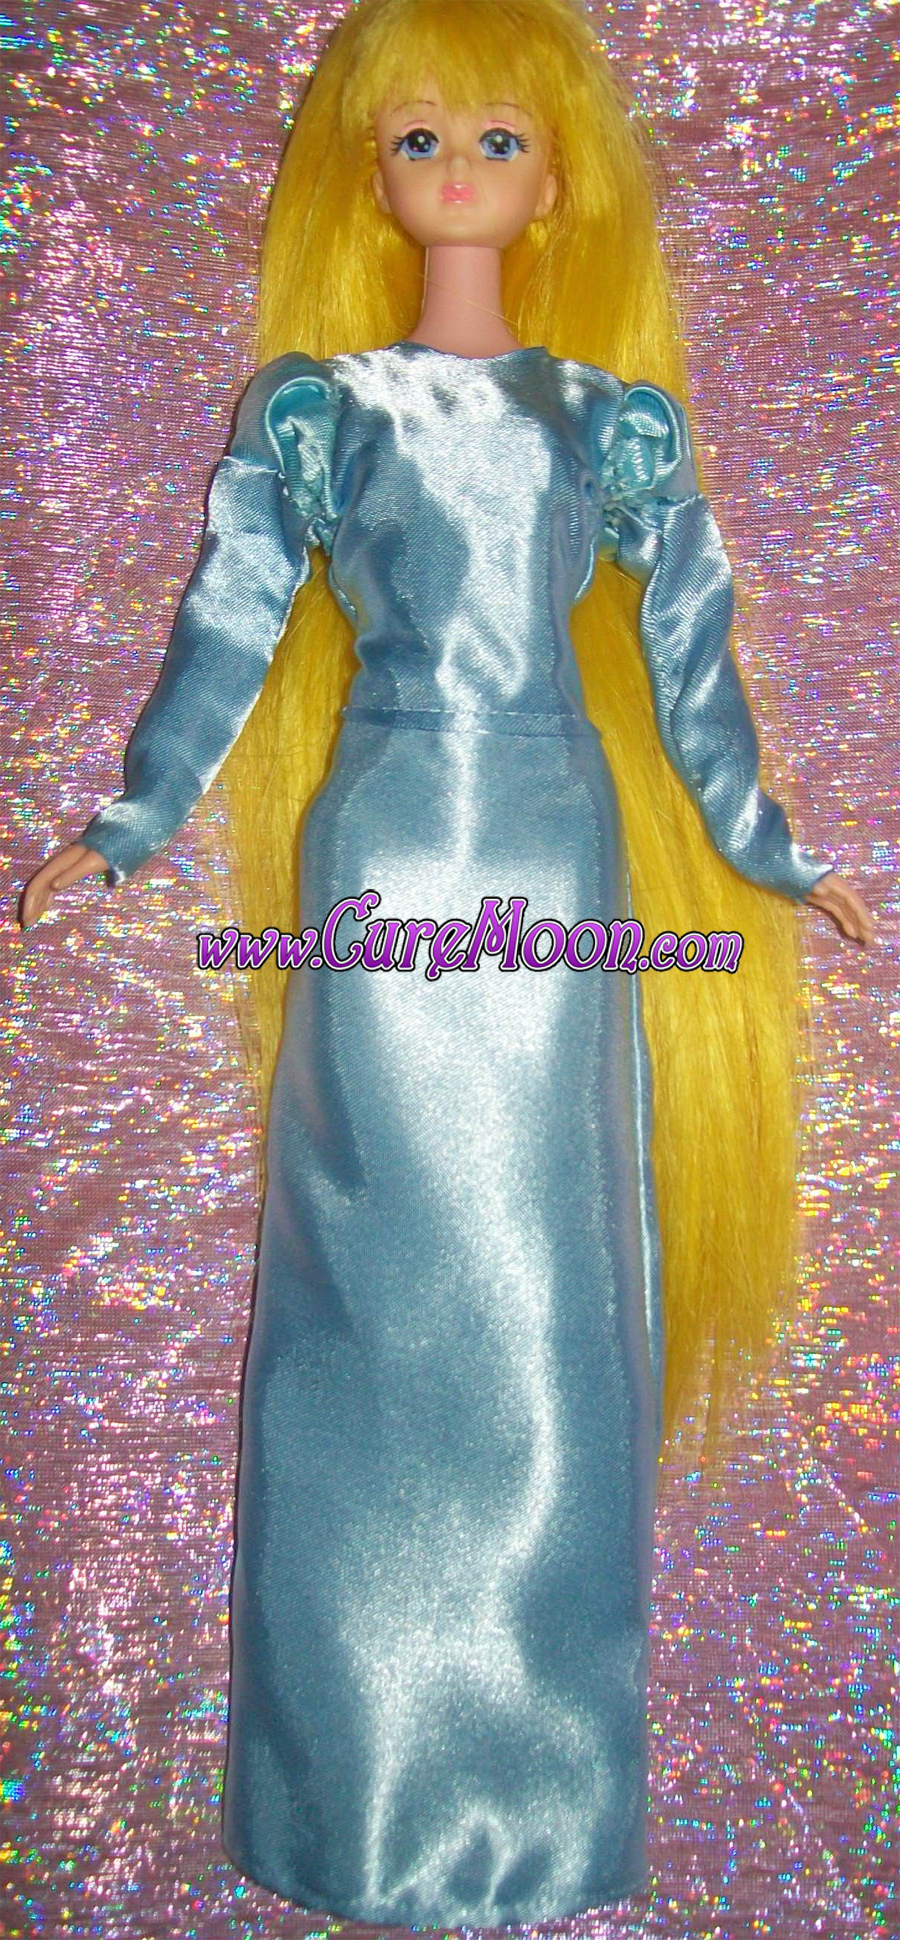 marina-mermaid-sirena-doll-bambola-custom-handmade-umana-human-curemoon-bunnytsukino